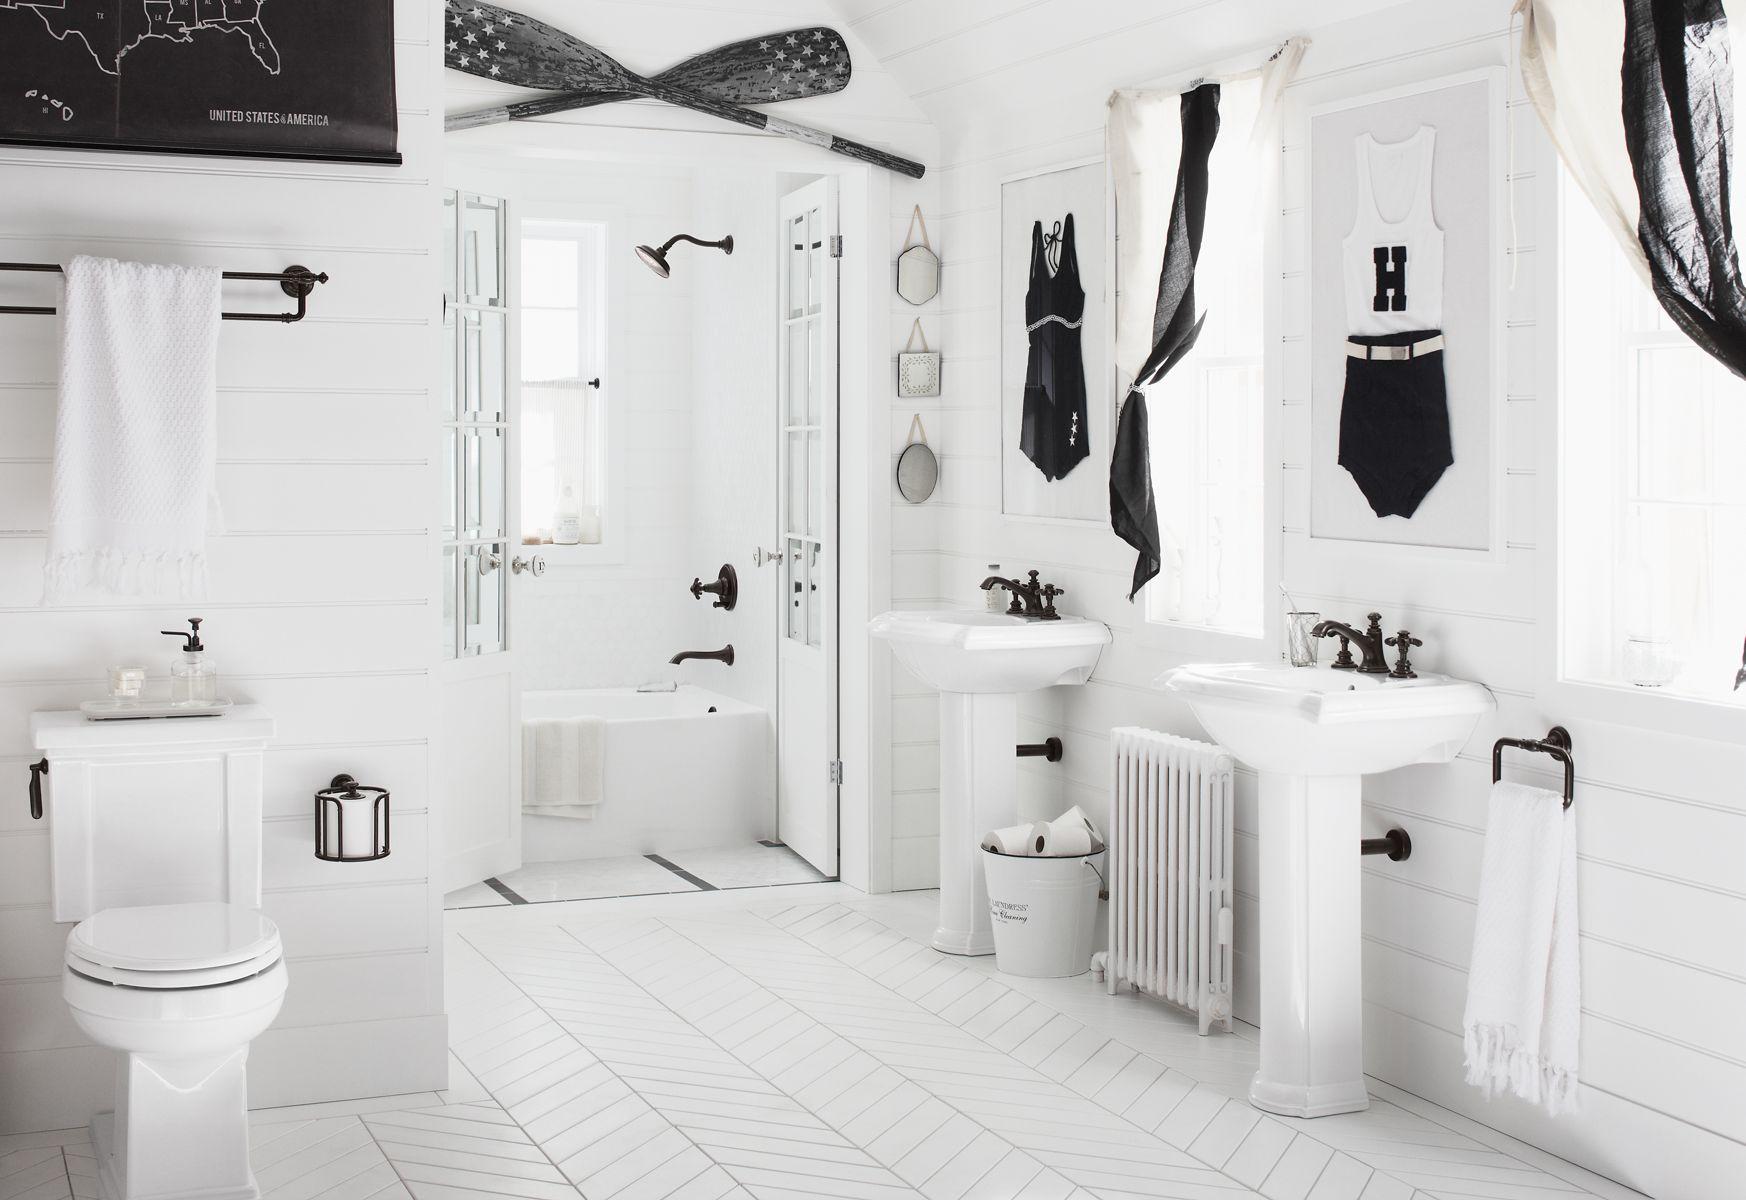 Bathroom Faucets For Sinks Tubs Showers Kohler